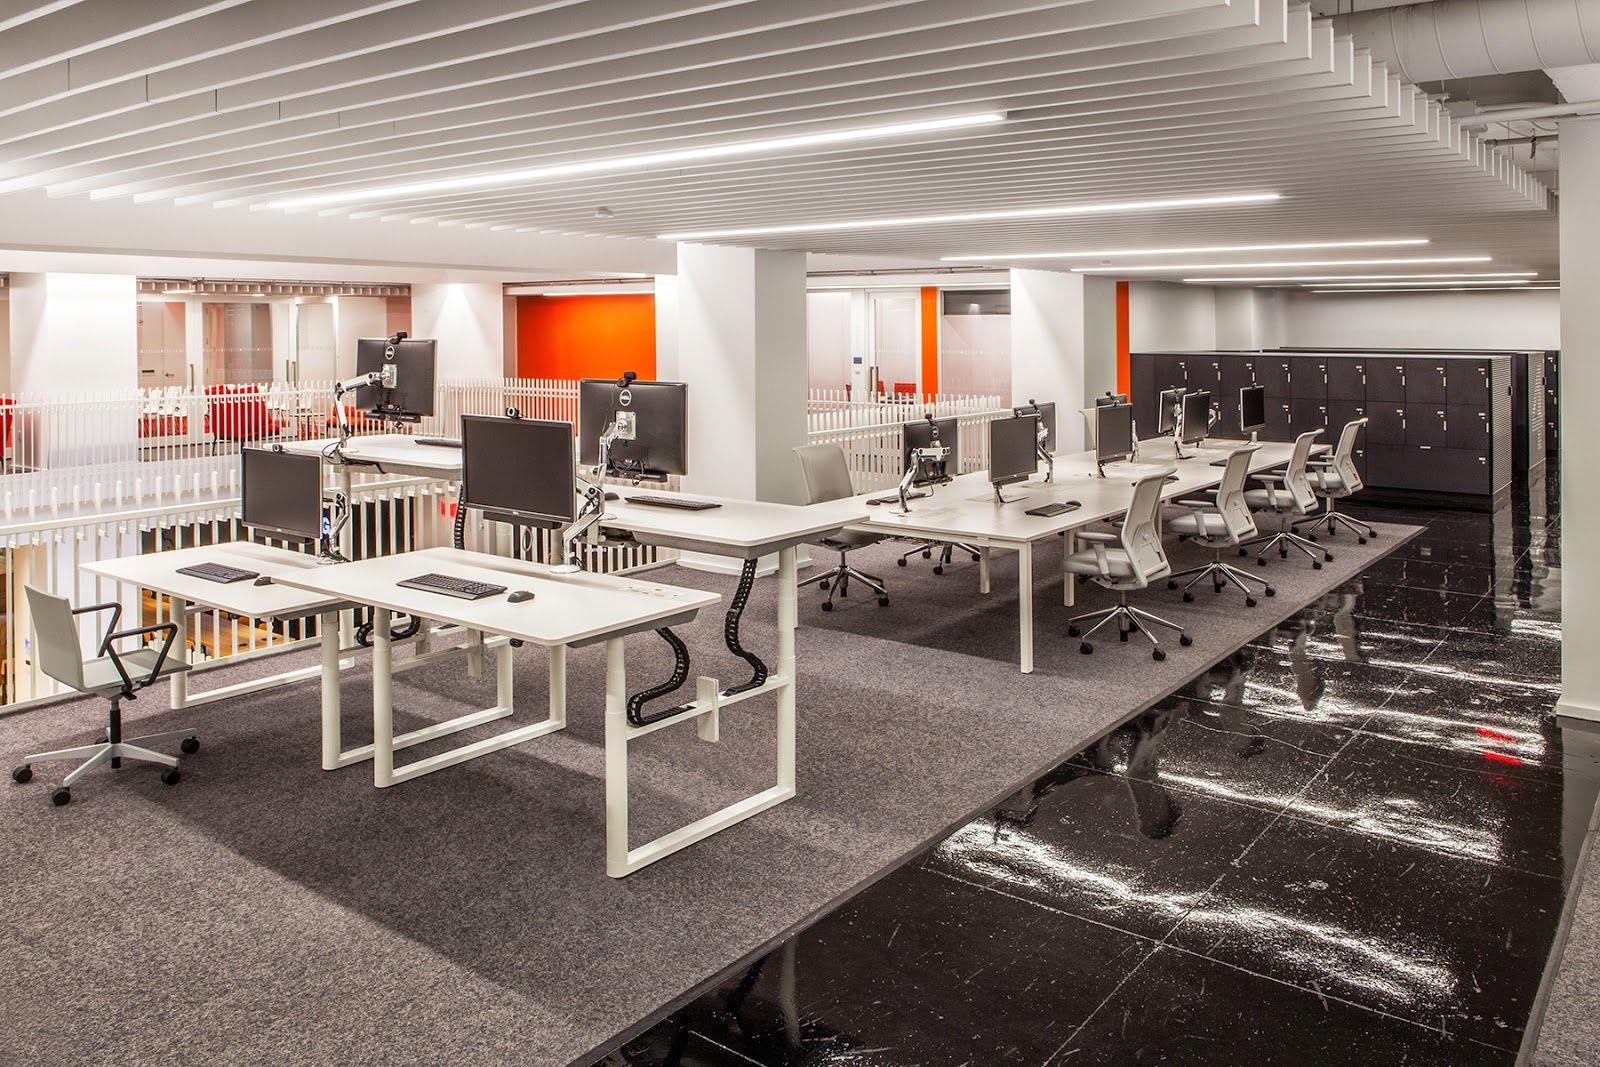 vitra glg new york tyde desk layout new york office furniture rh pinterest com